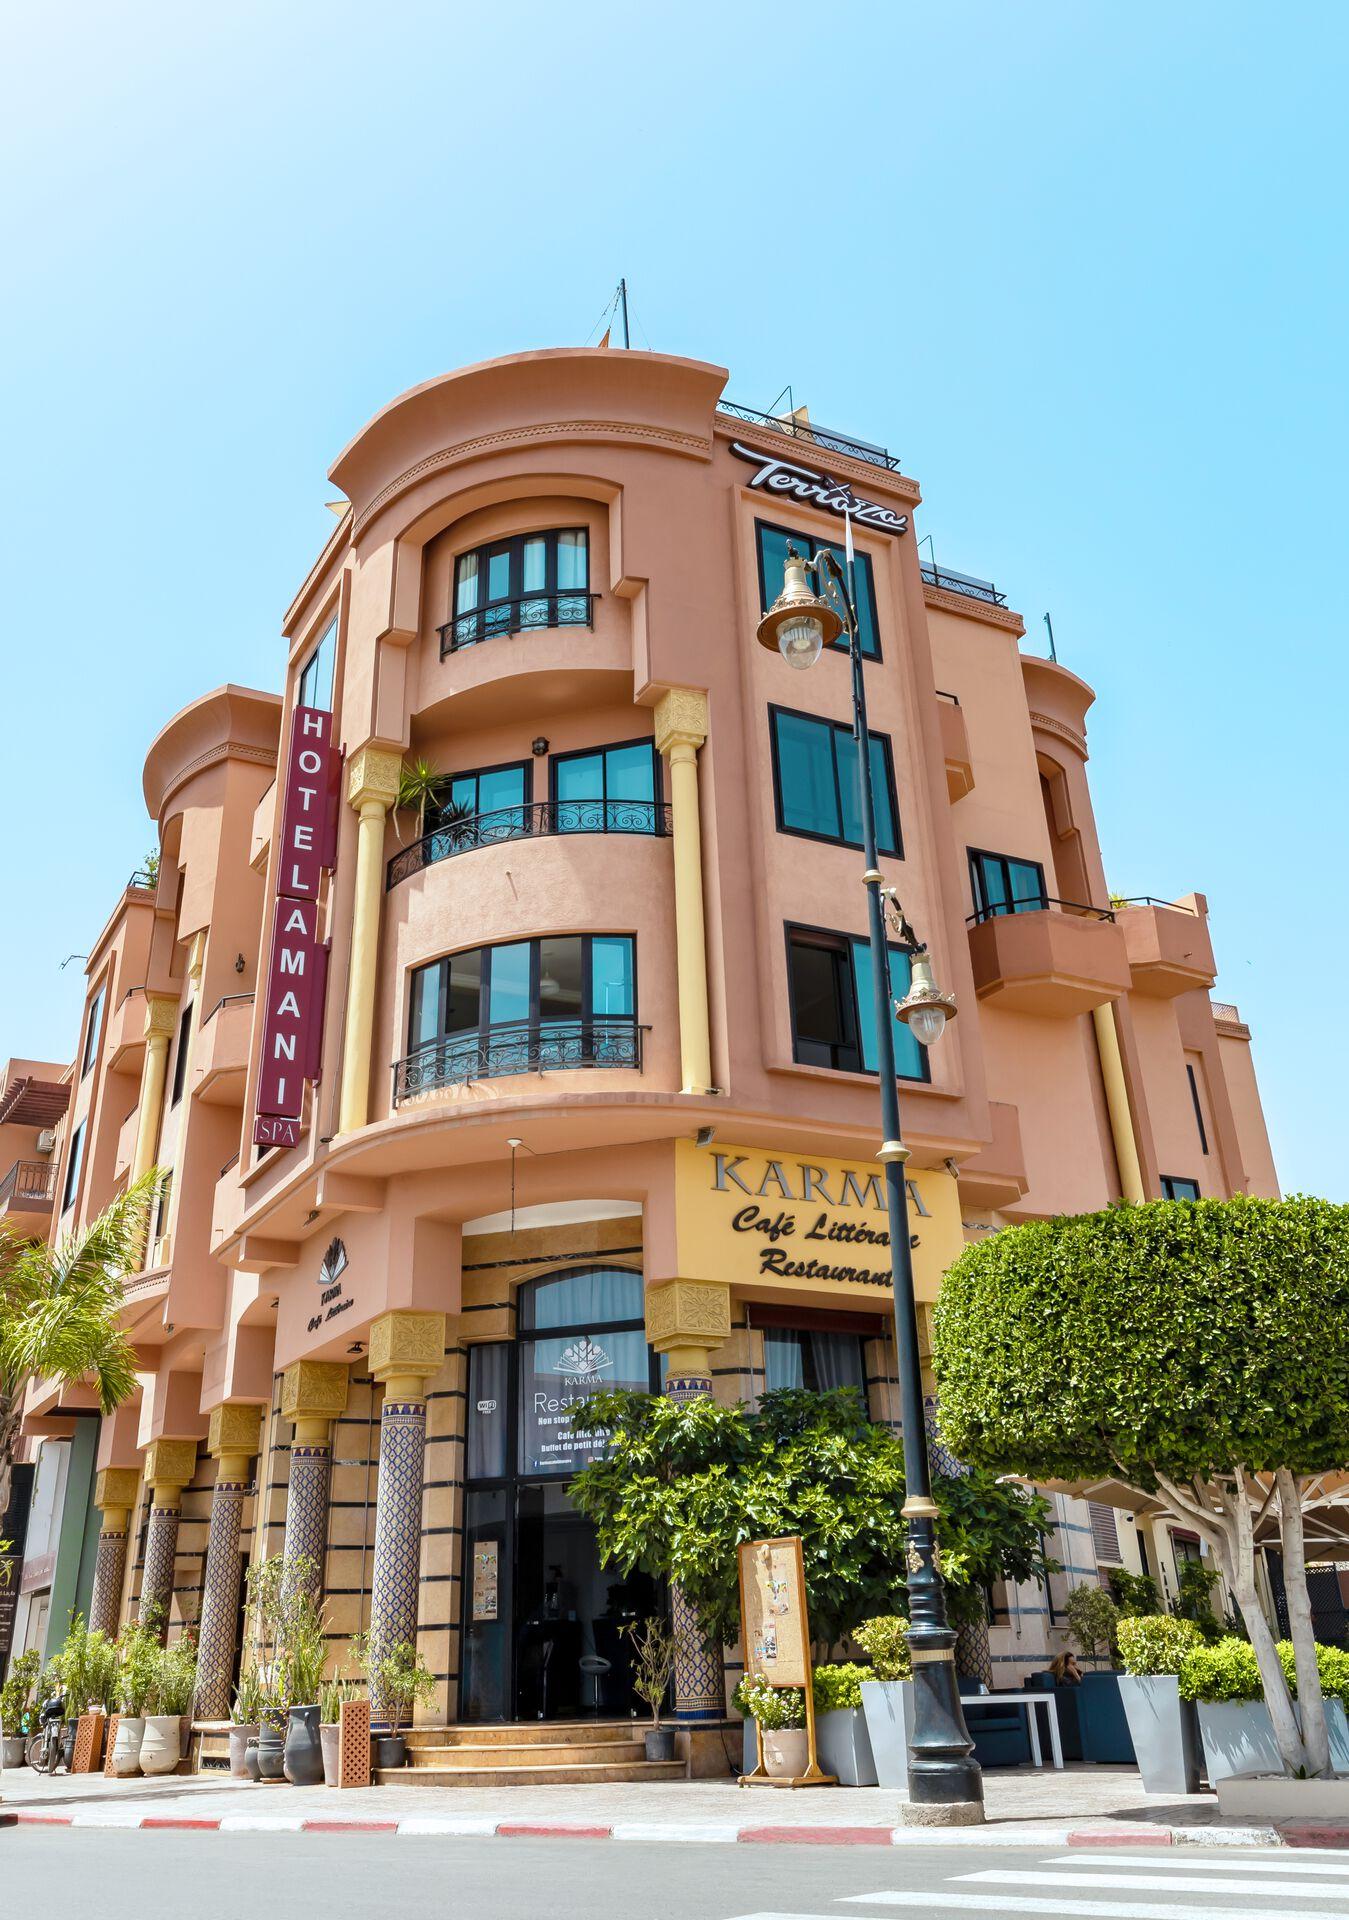 Amani Hotel Appart - 3*